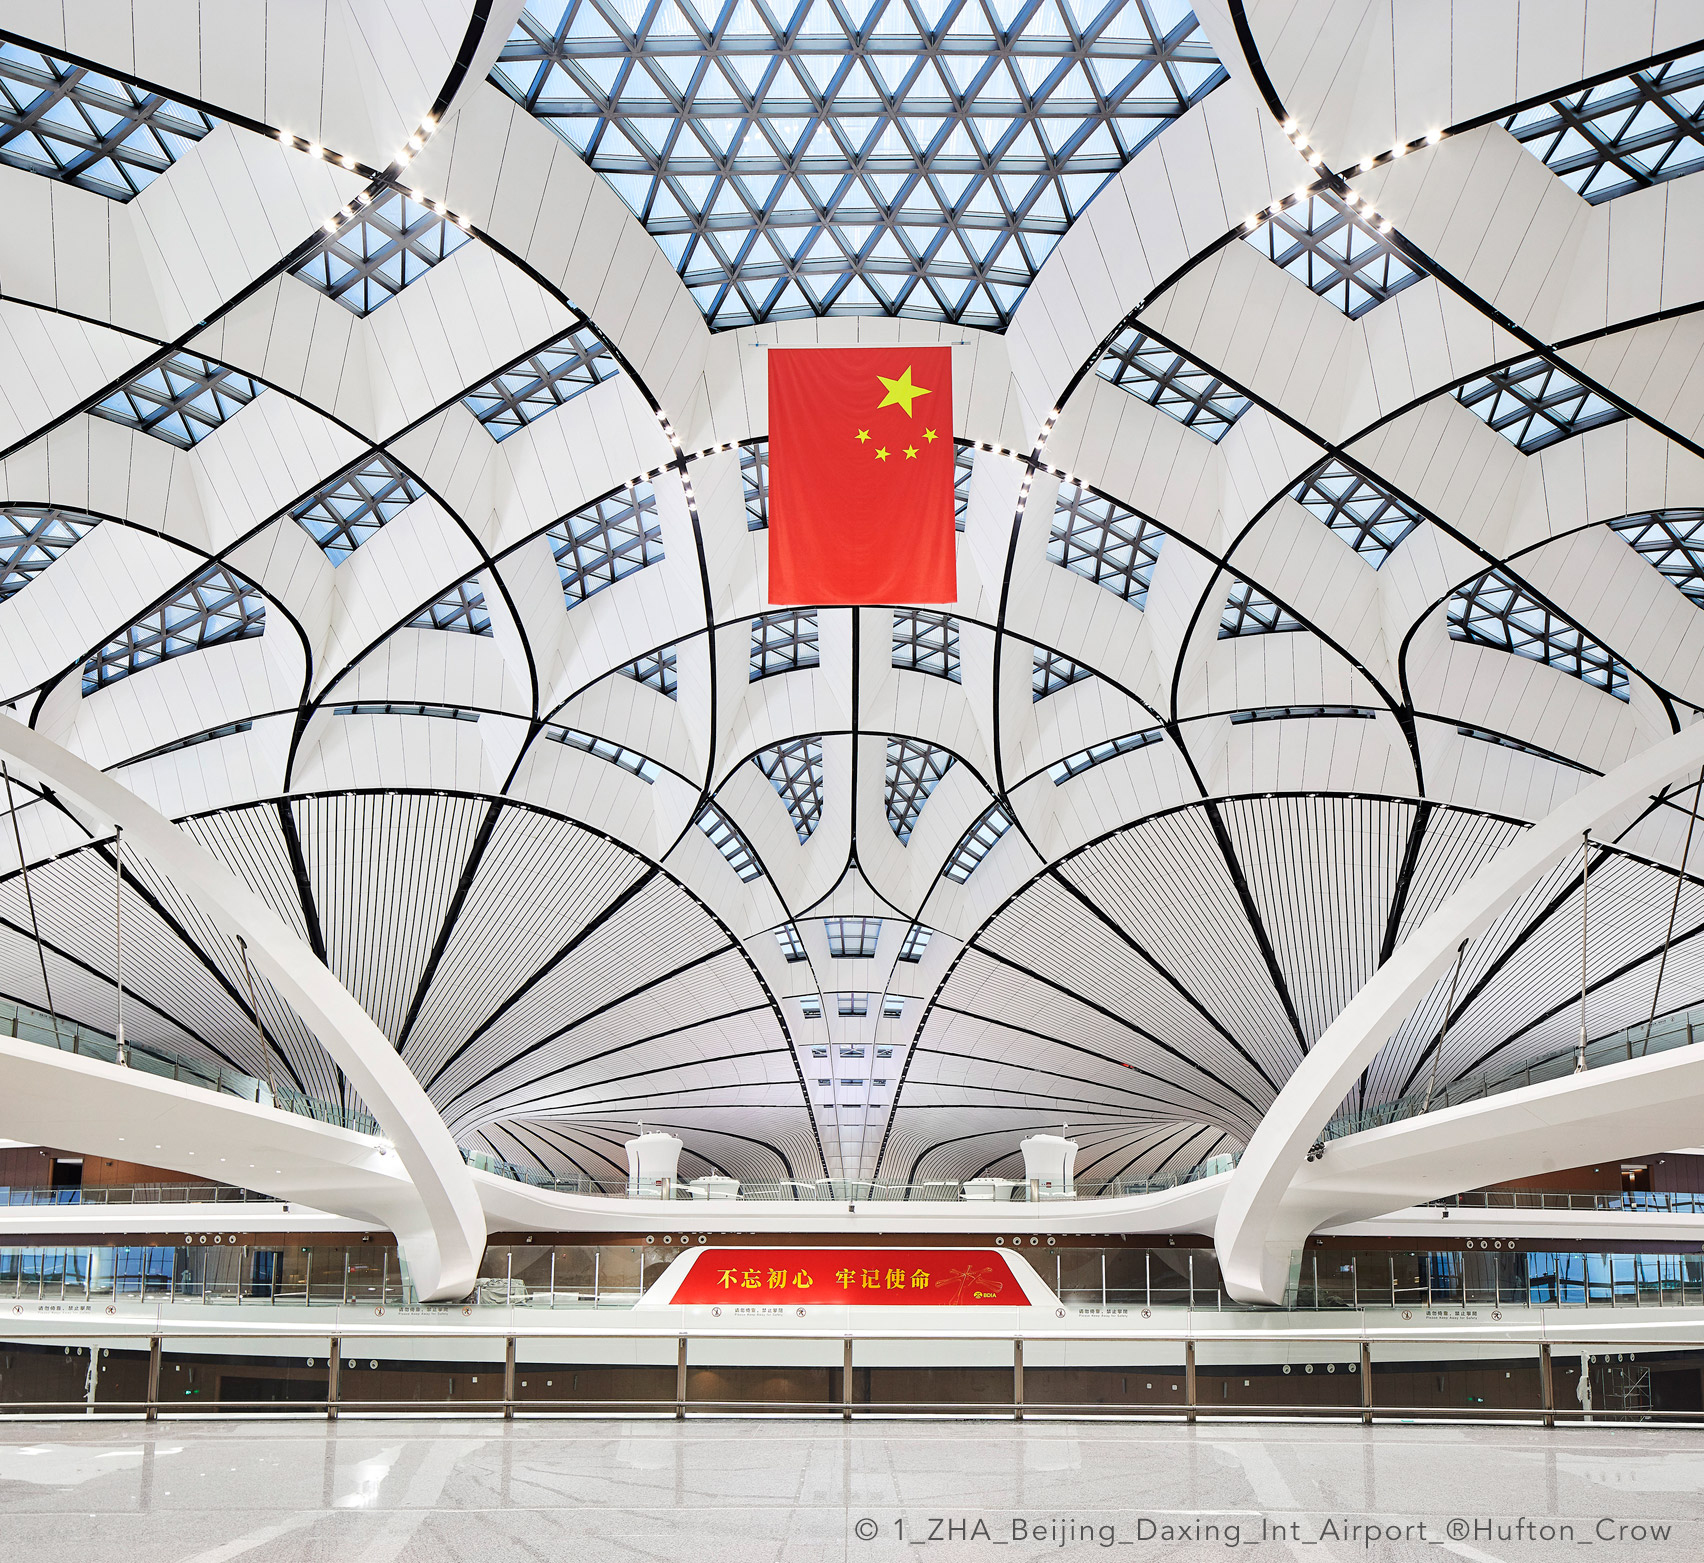 1_ZHA_Beijing_Daxing_Int_Airport_®Hufton_Crow